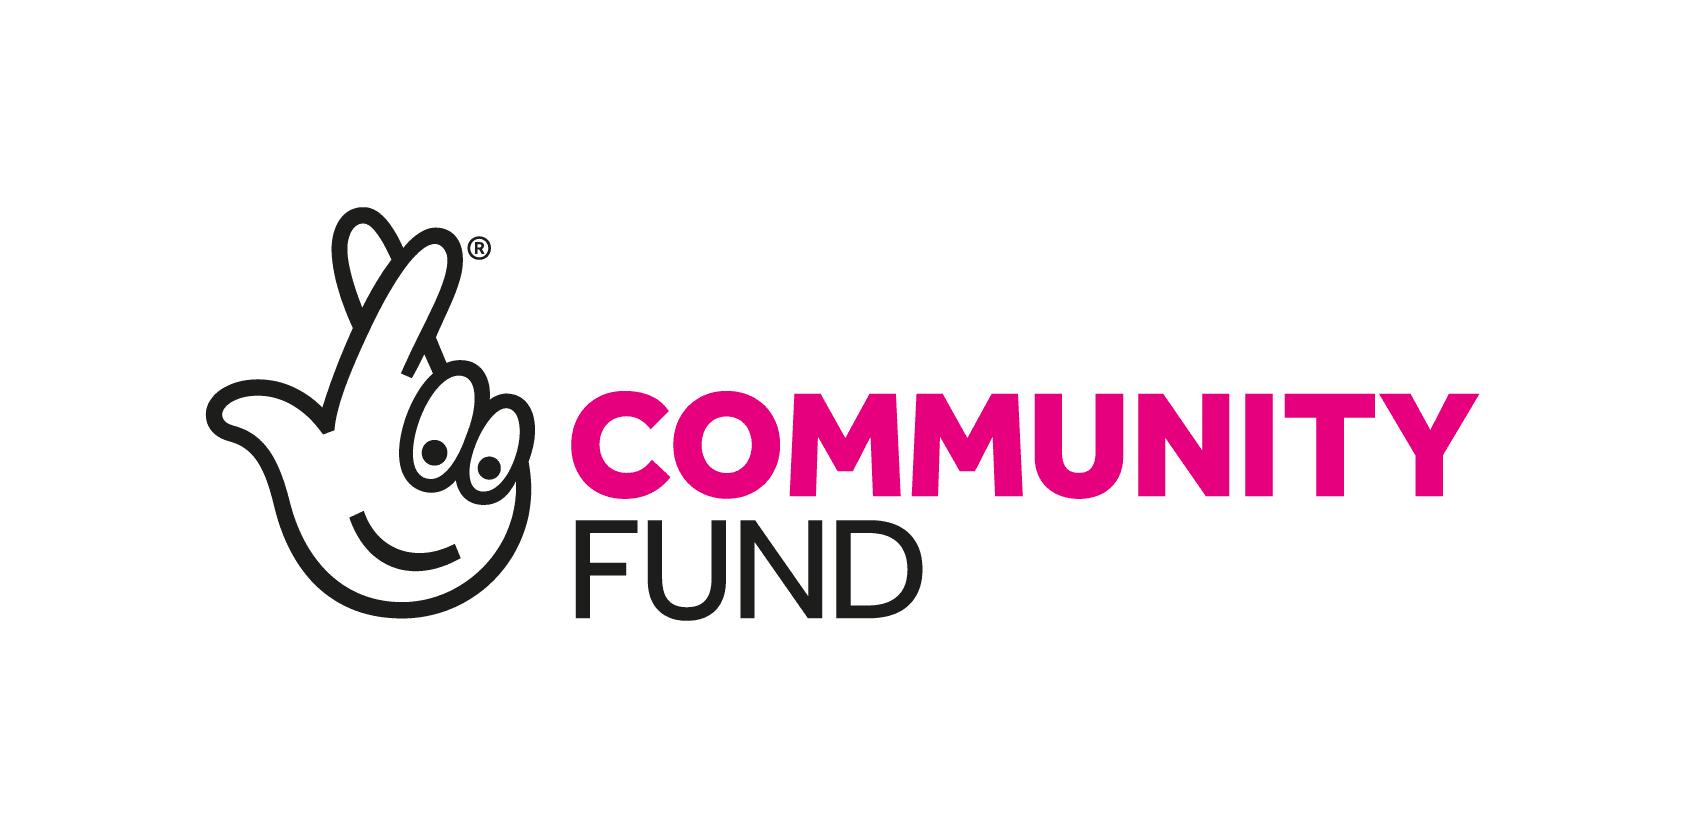 Community funding logo